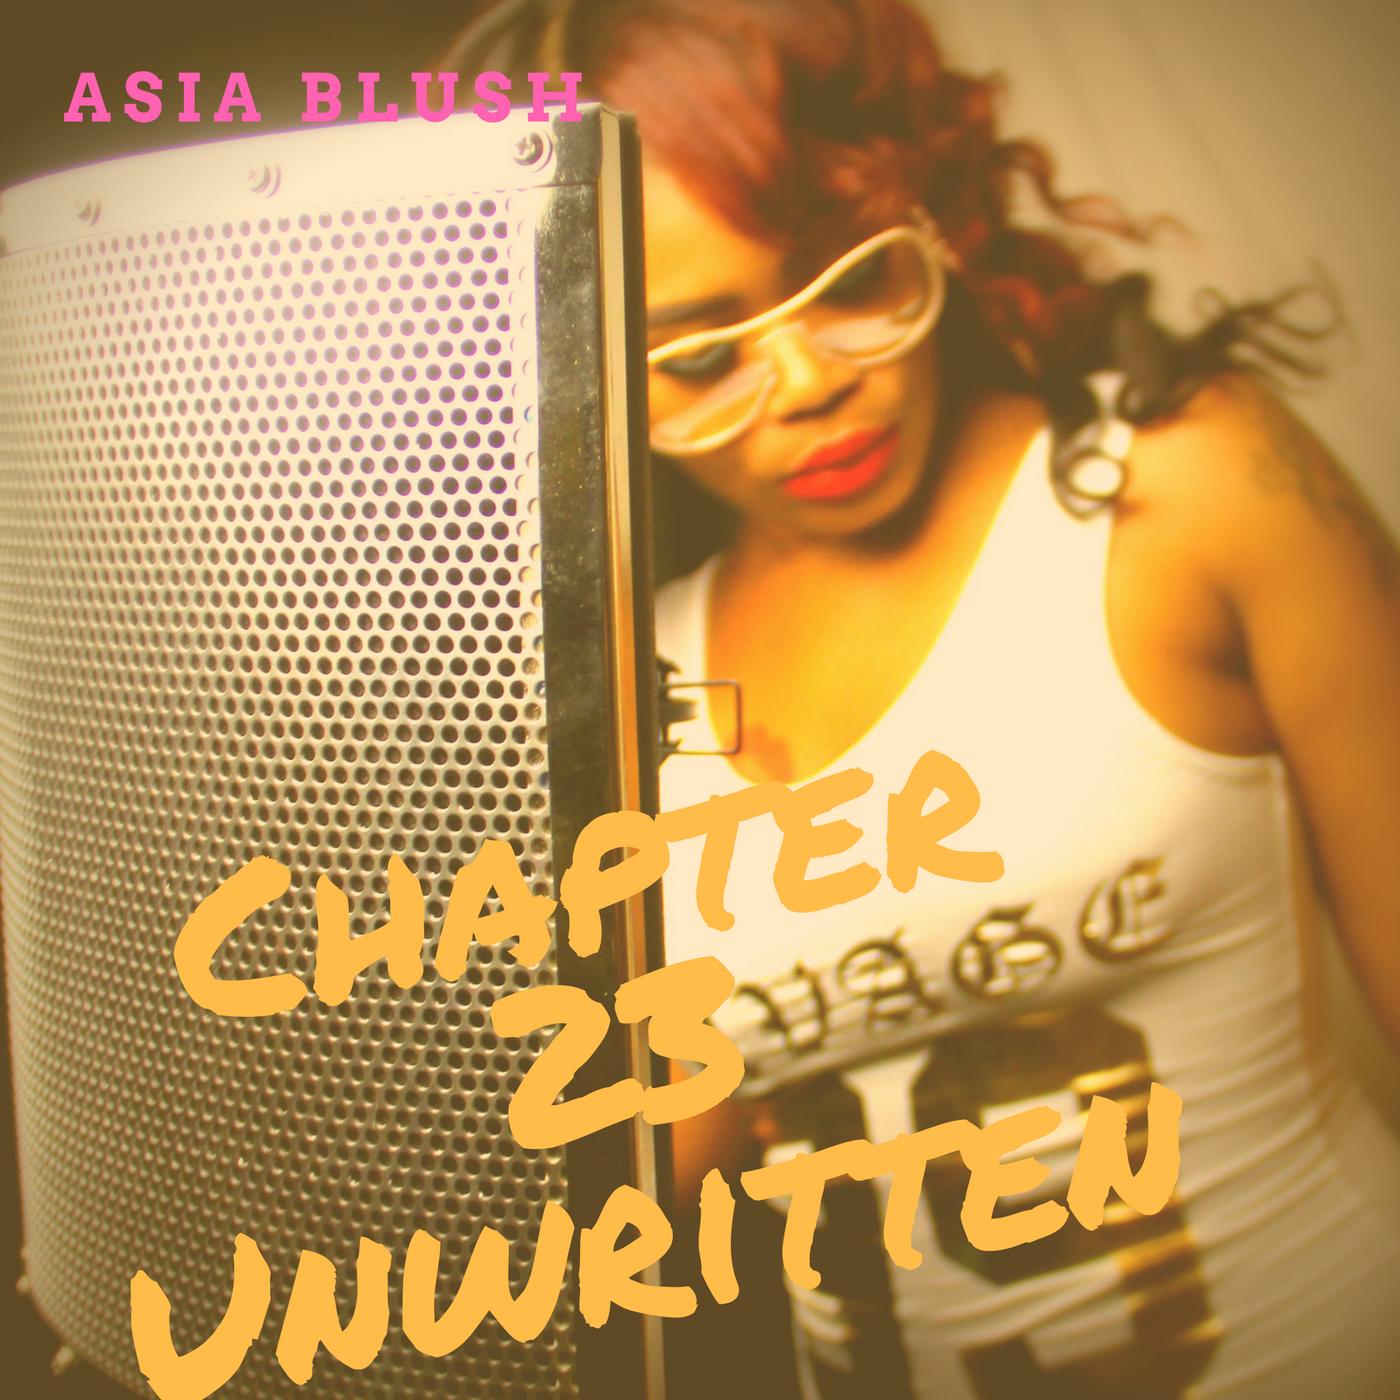 Asia Blush